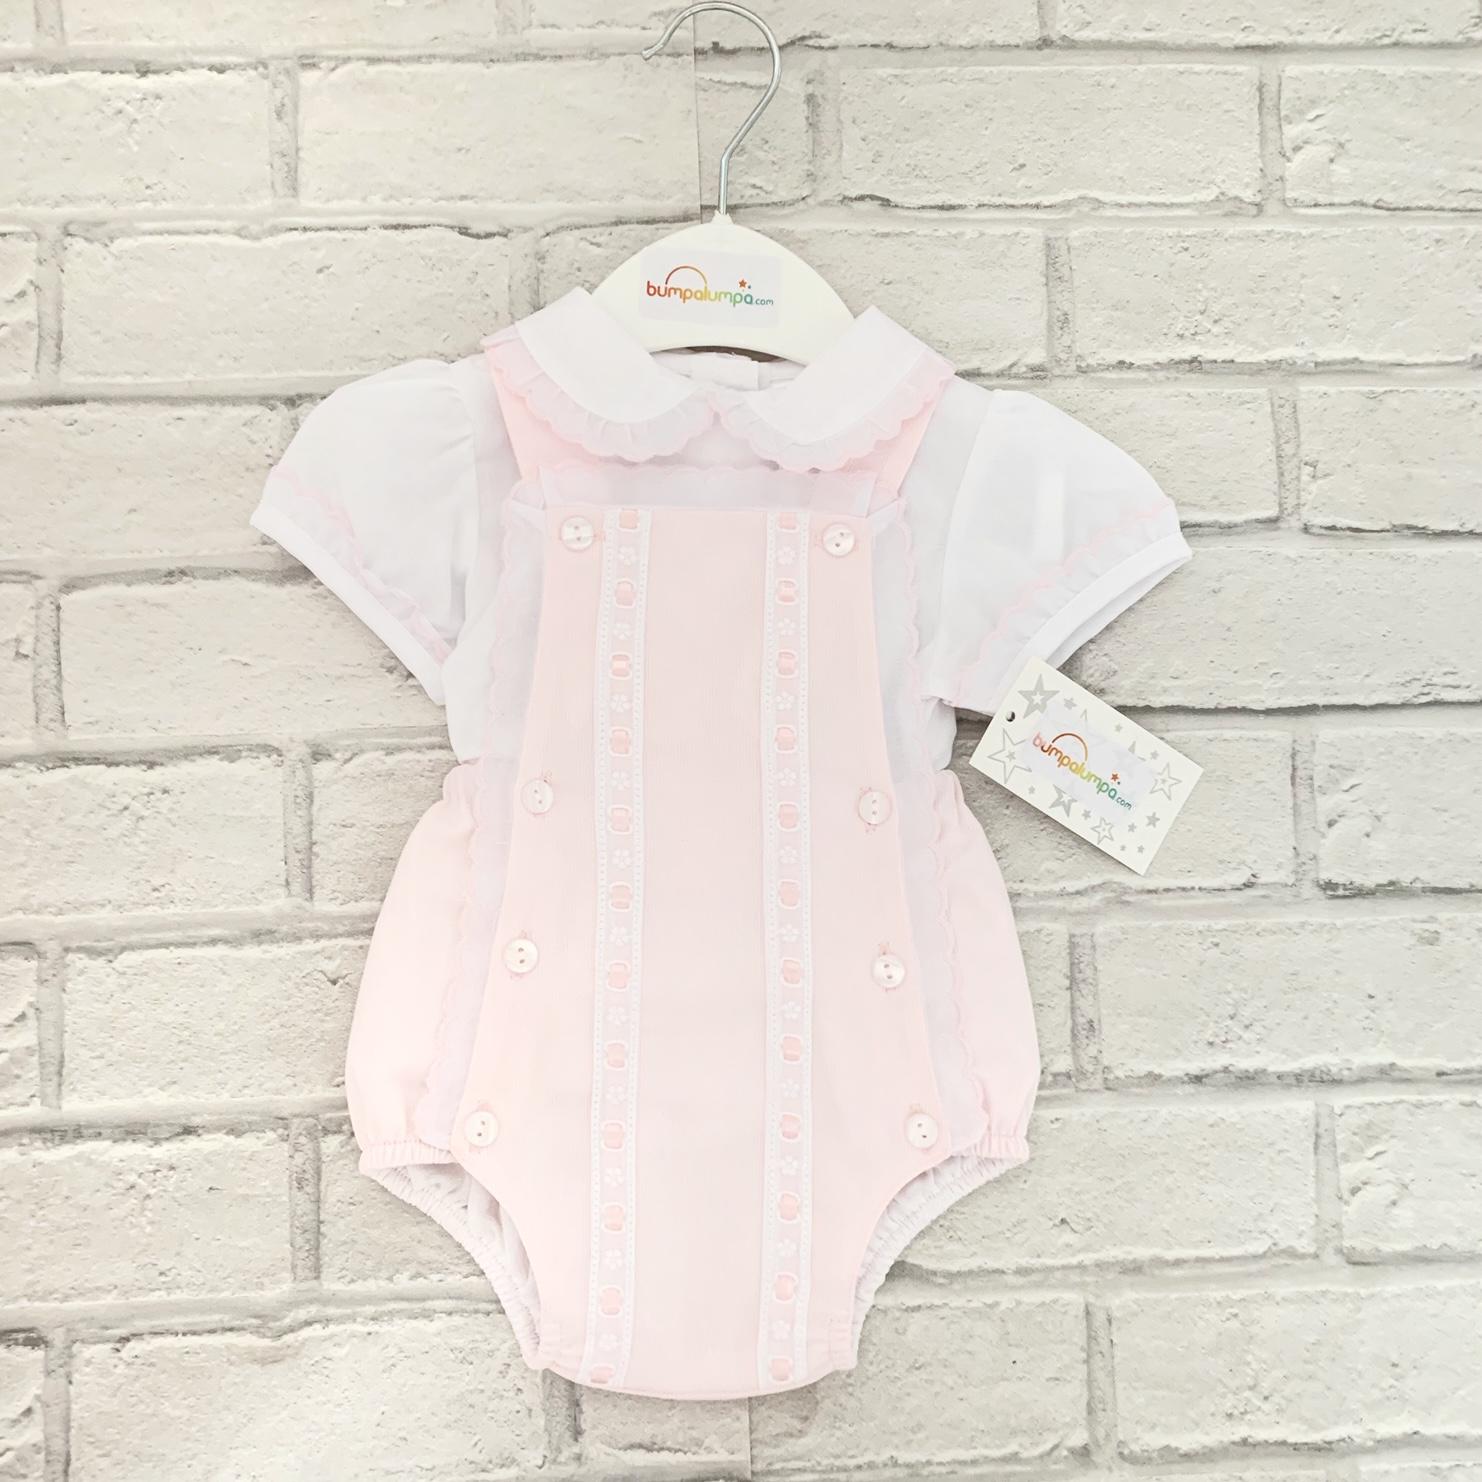 6301e8569f92 Baby Girls Pink Dungaree Shorts   White Blouse Set